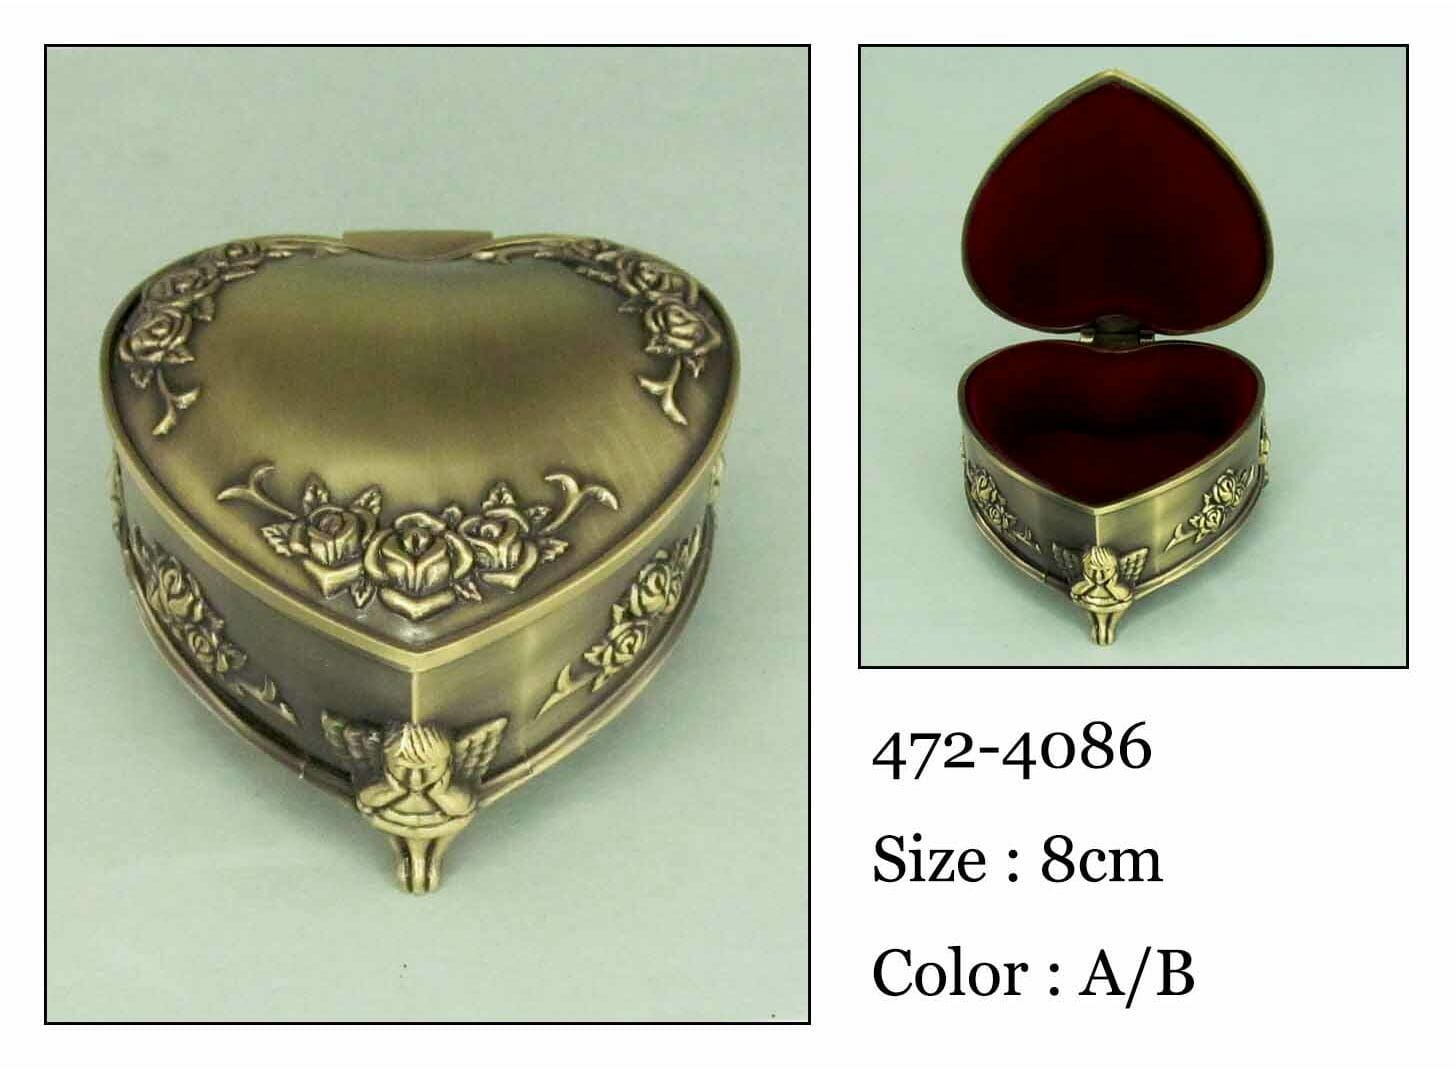 Kasetka, stare złoto, 9x7 cm